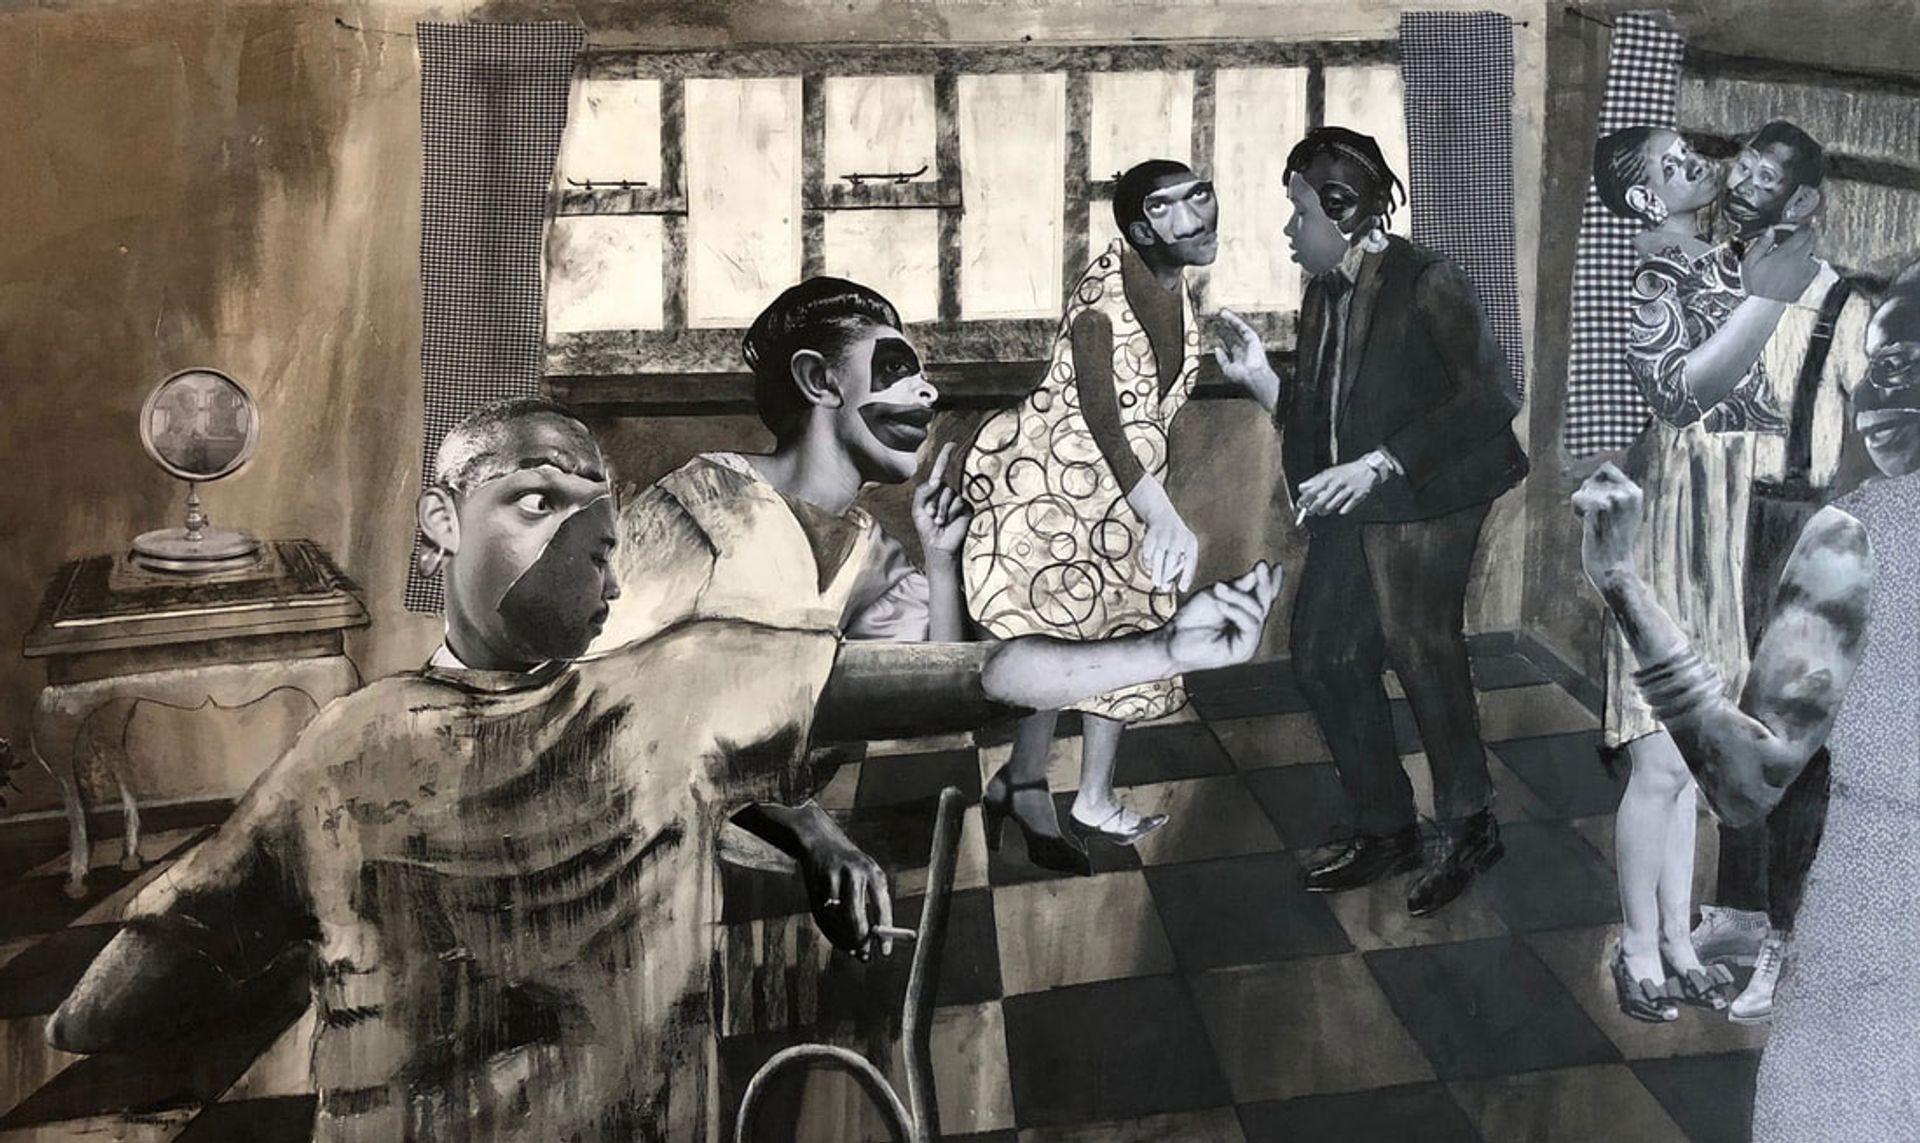 Neo Matloga's Nna le khaitseli ea ka (2019) is on show with Ron Mandos gallery © Neo Matloga, courtesy of Ron Mandos gallery